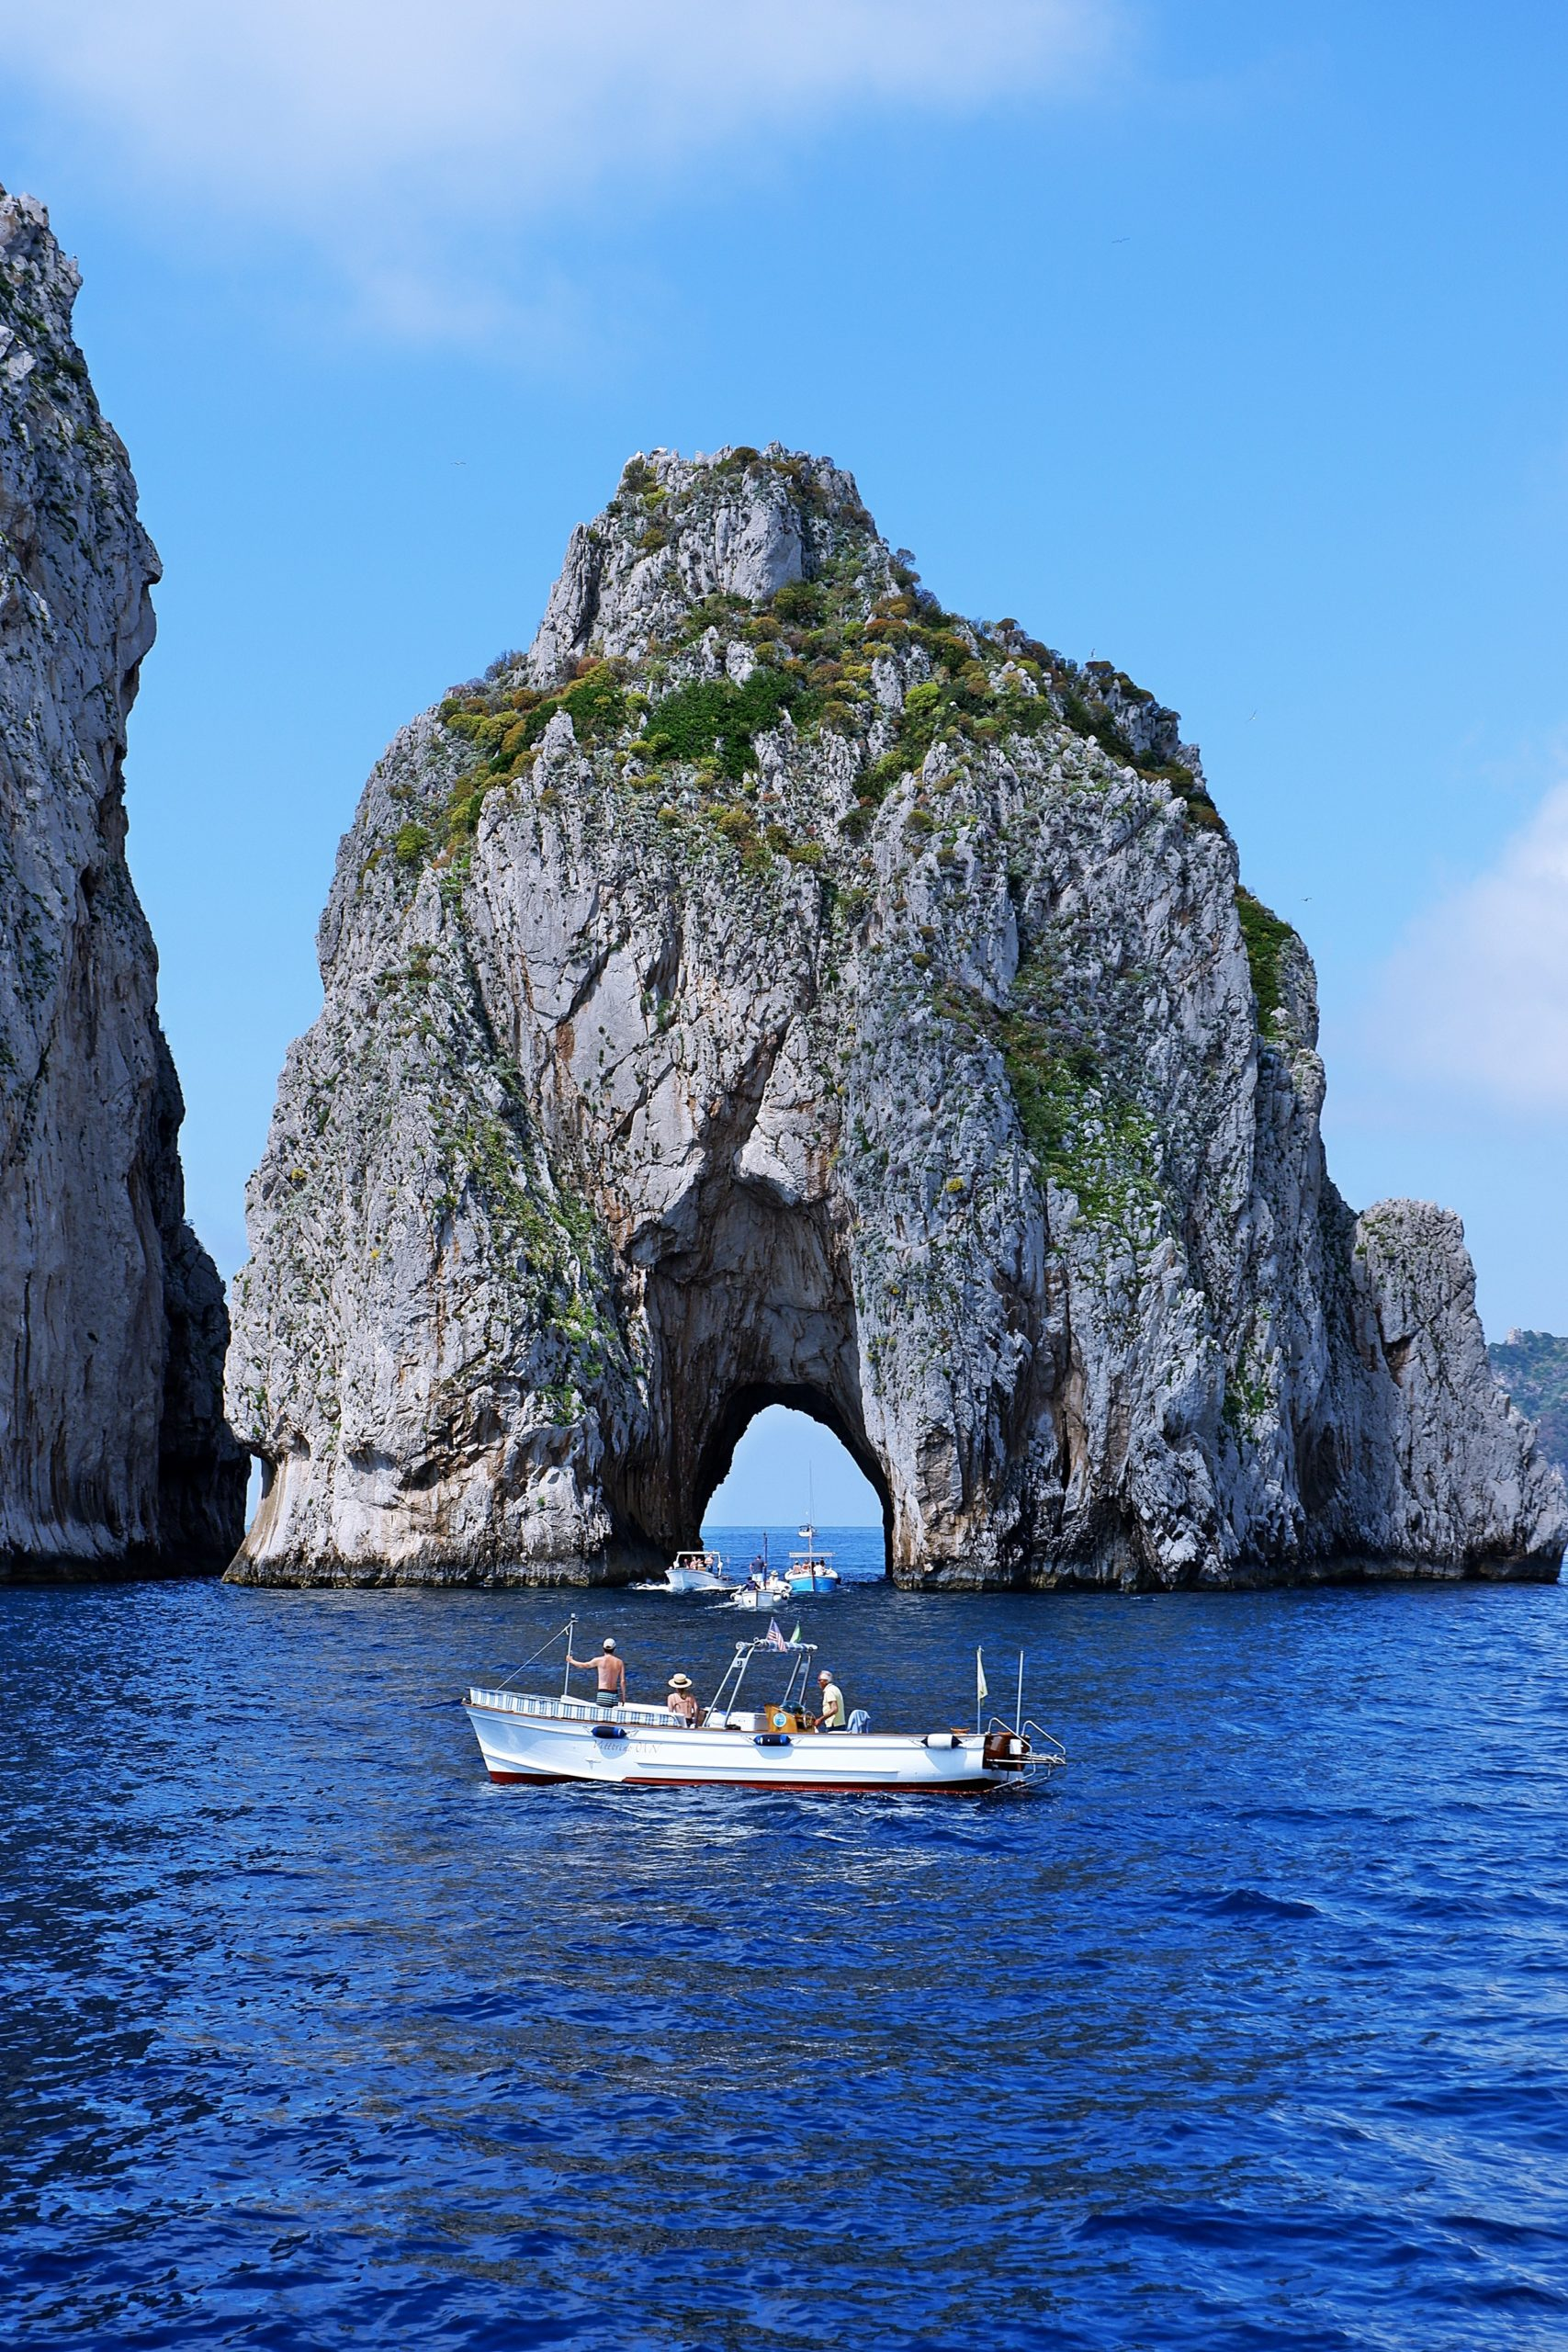 white power boat beside rock formation